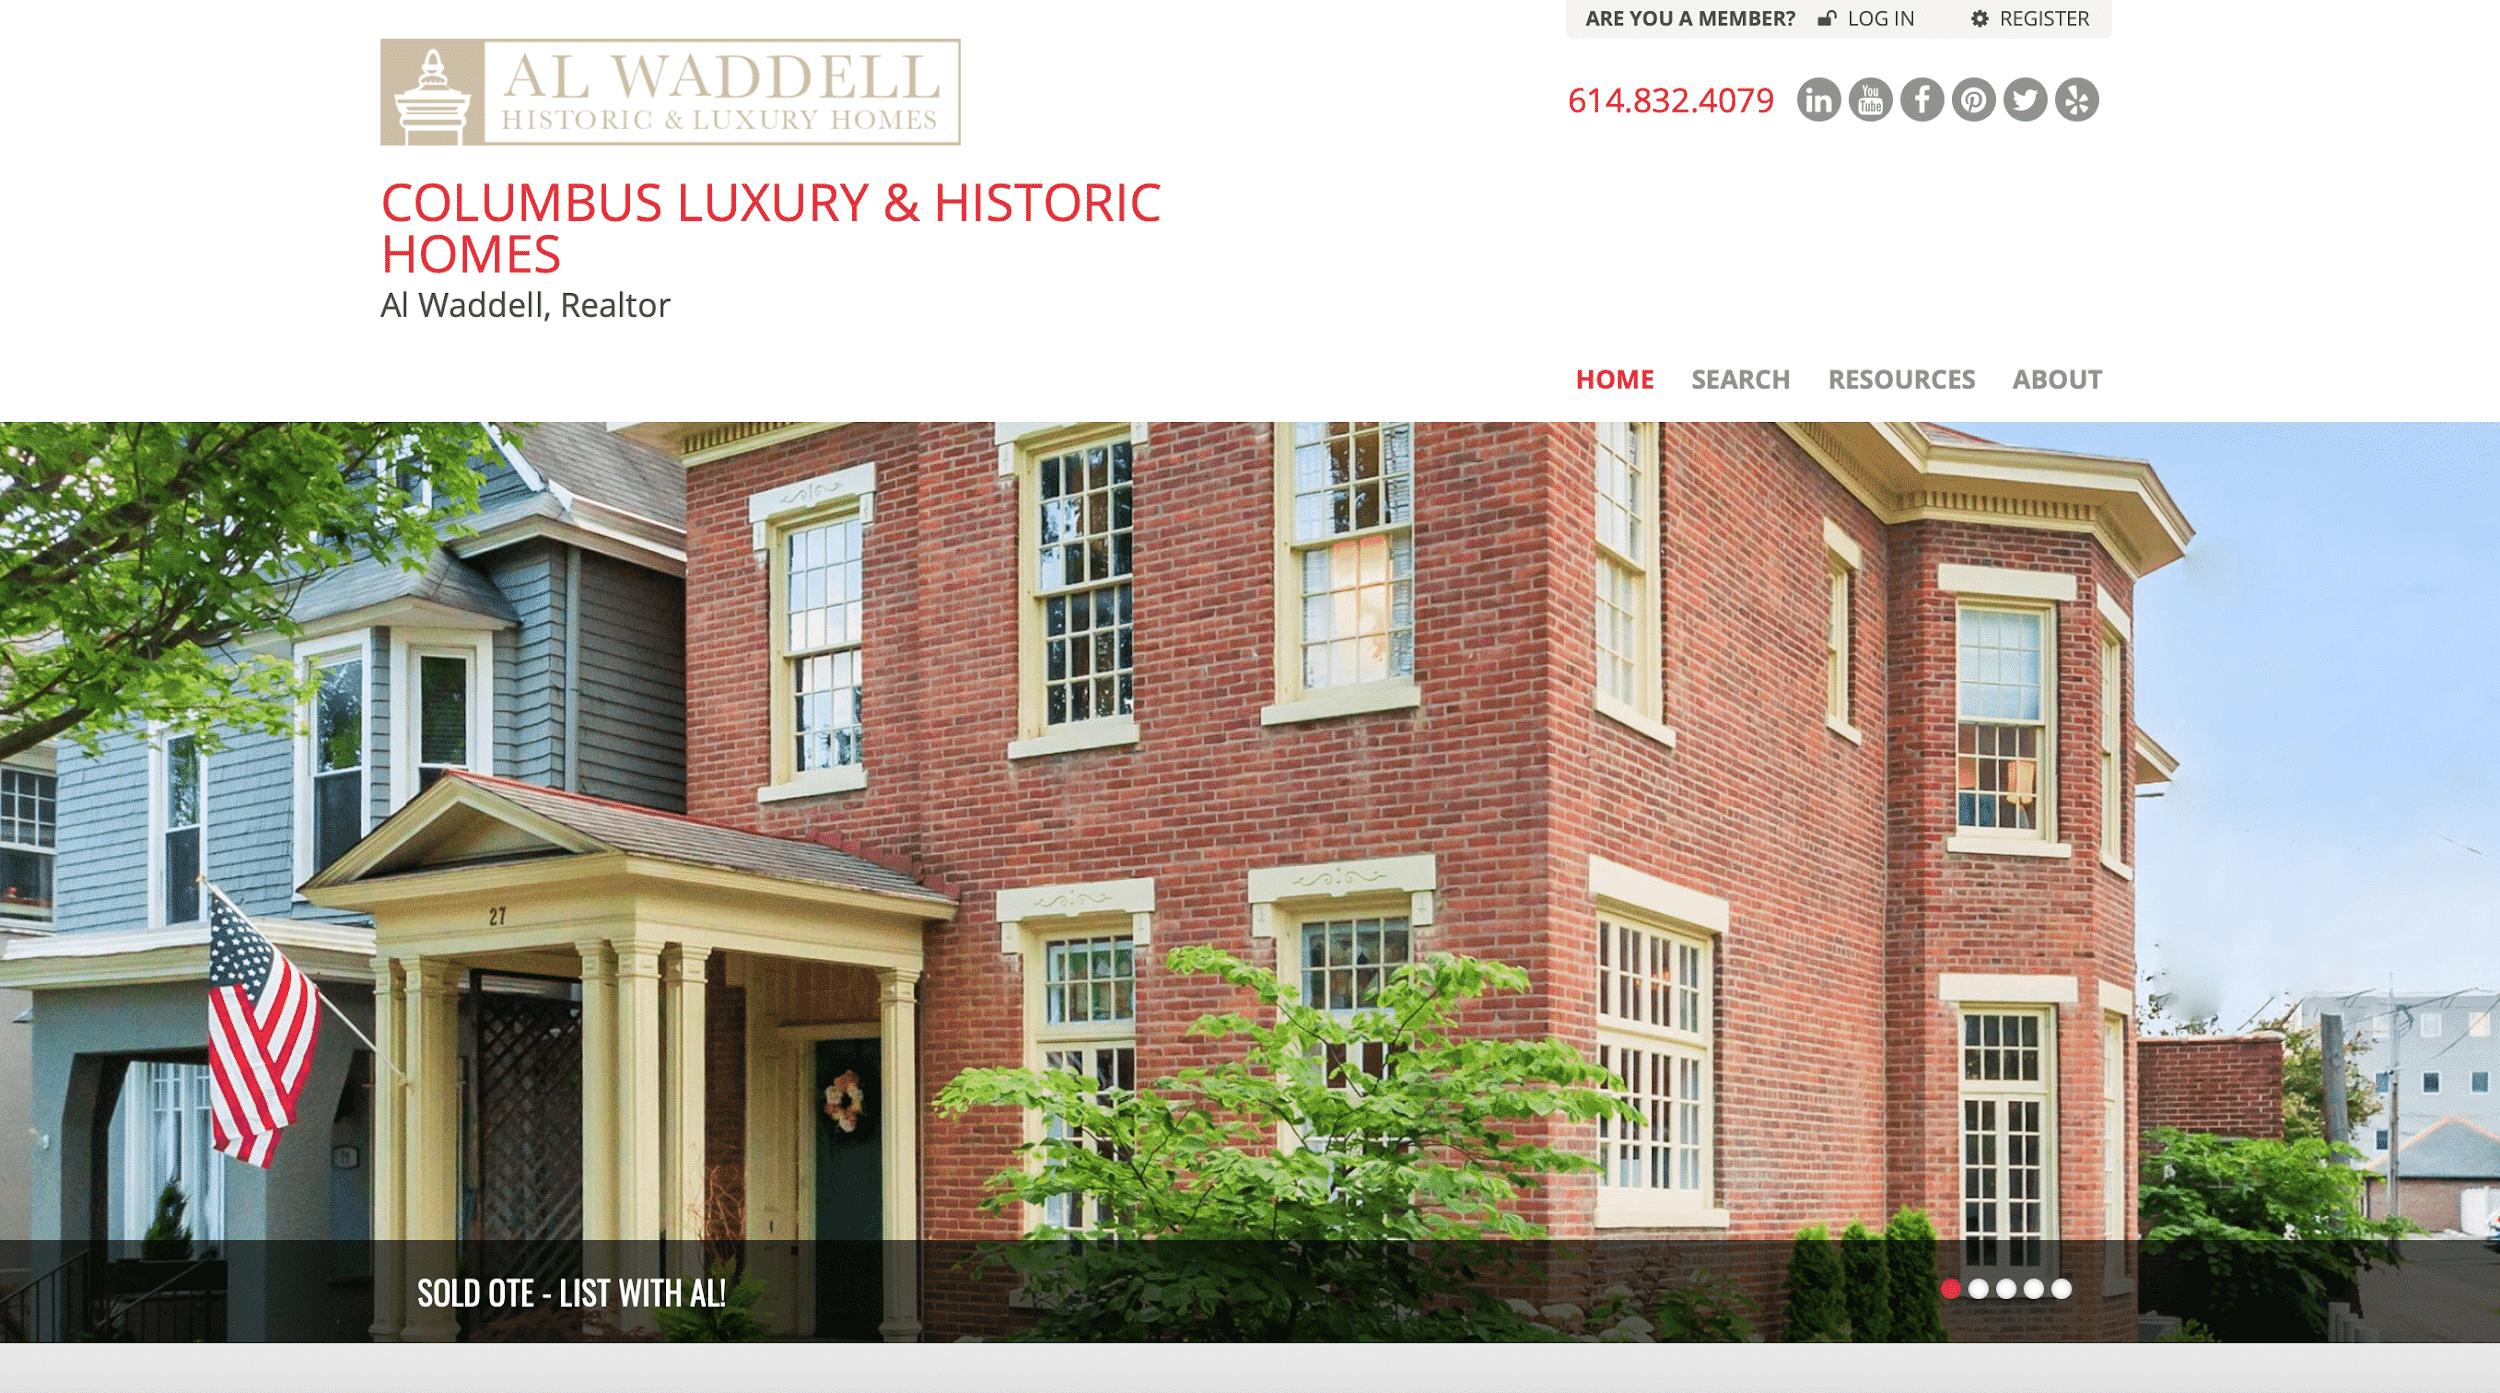 Al Waddell website